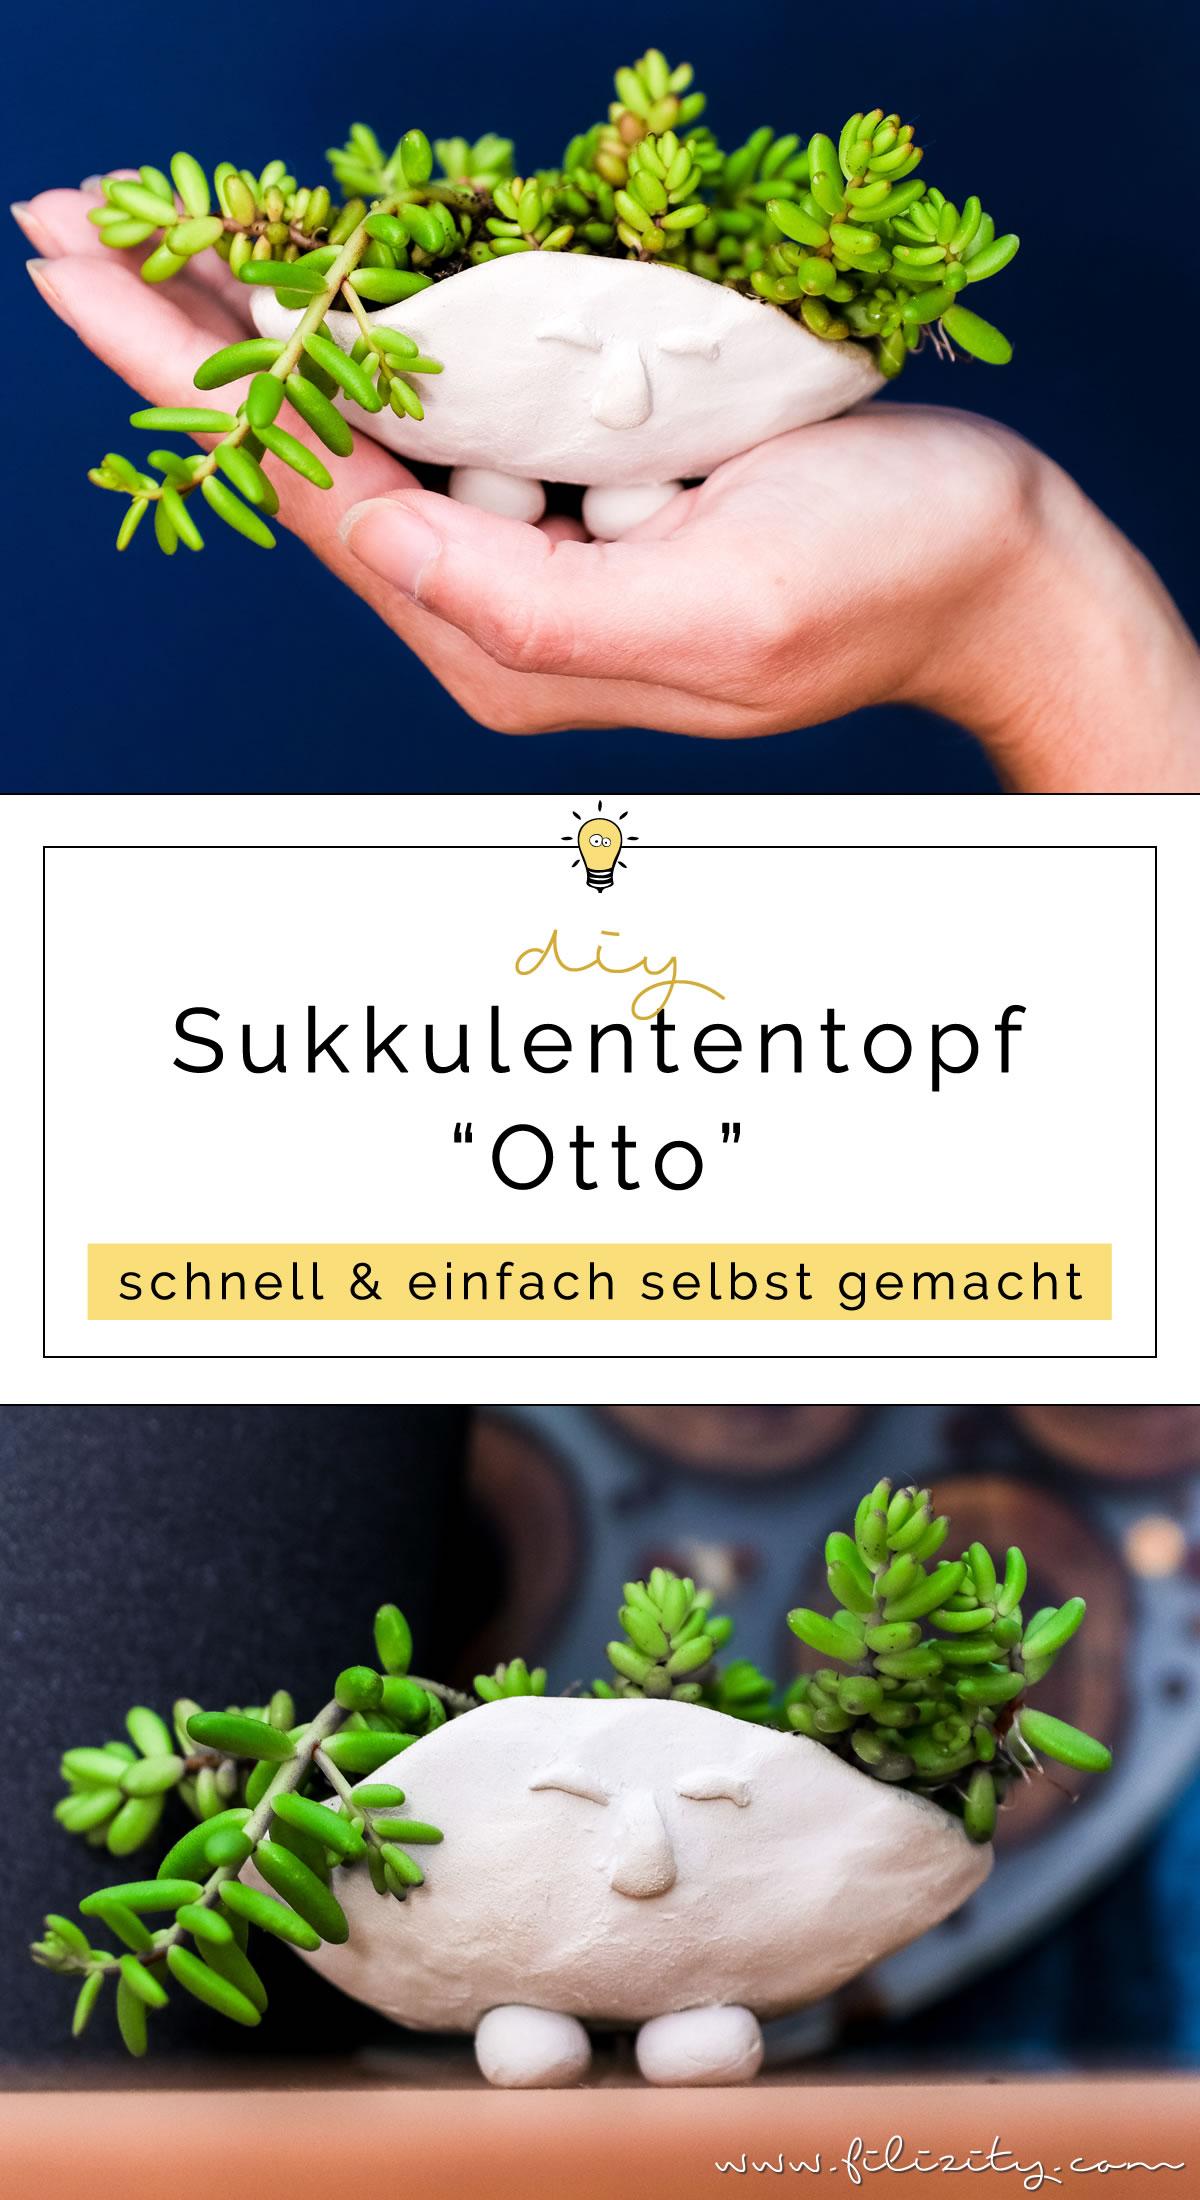 DIY Blumentopf mit Gesicht selber machen - 5 Blogs 1000 Ideen | Filizity.com - DIY Blog aus dem Rheinland #sukkulenten #fimo #urbanjungle